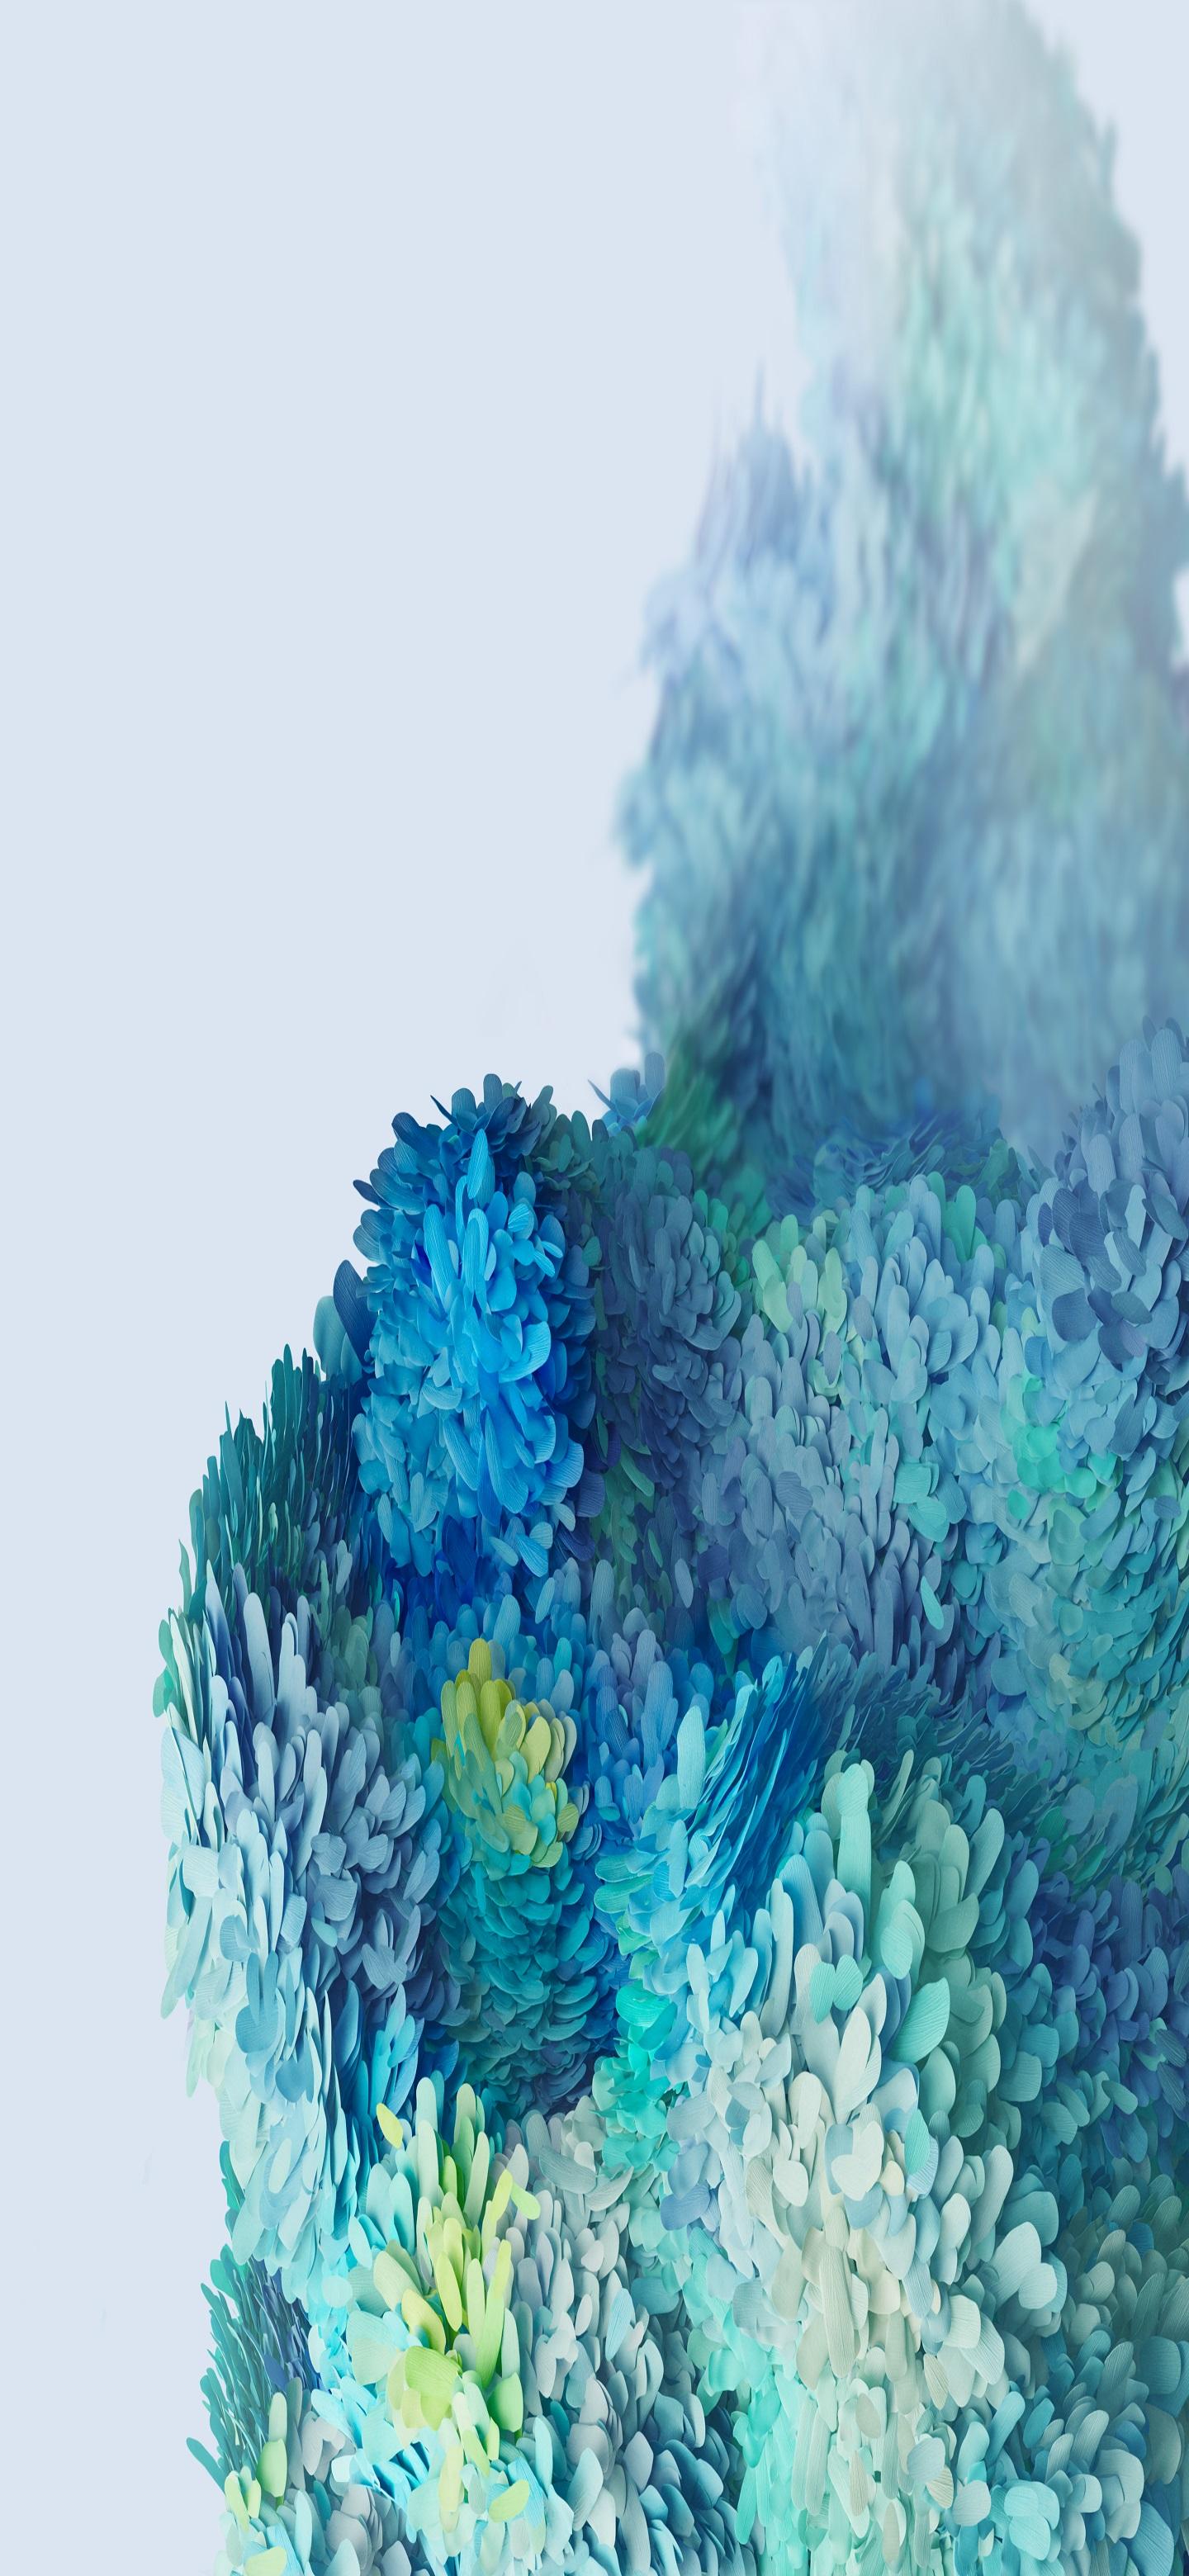 Samsung Galaxy S20 Wallpaper UseWallpaper 1 1440x3120 2190000065 1440x3120